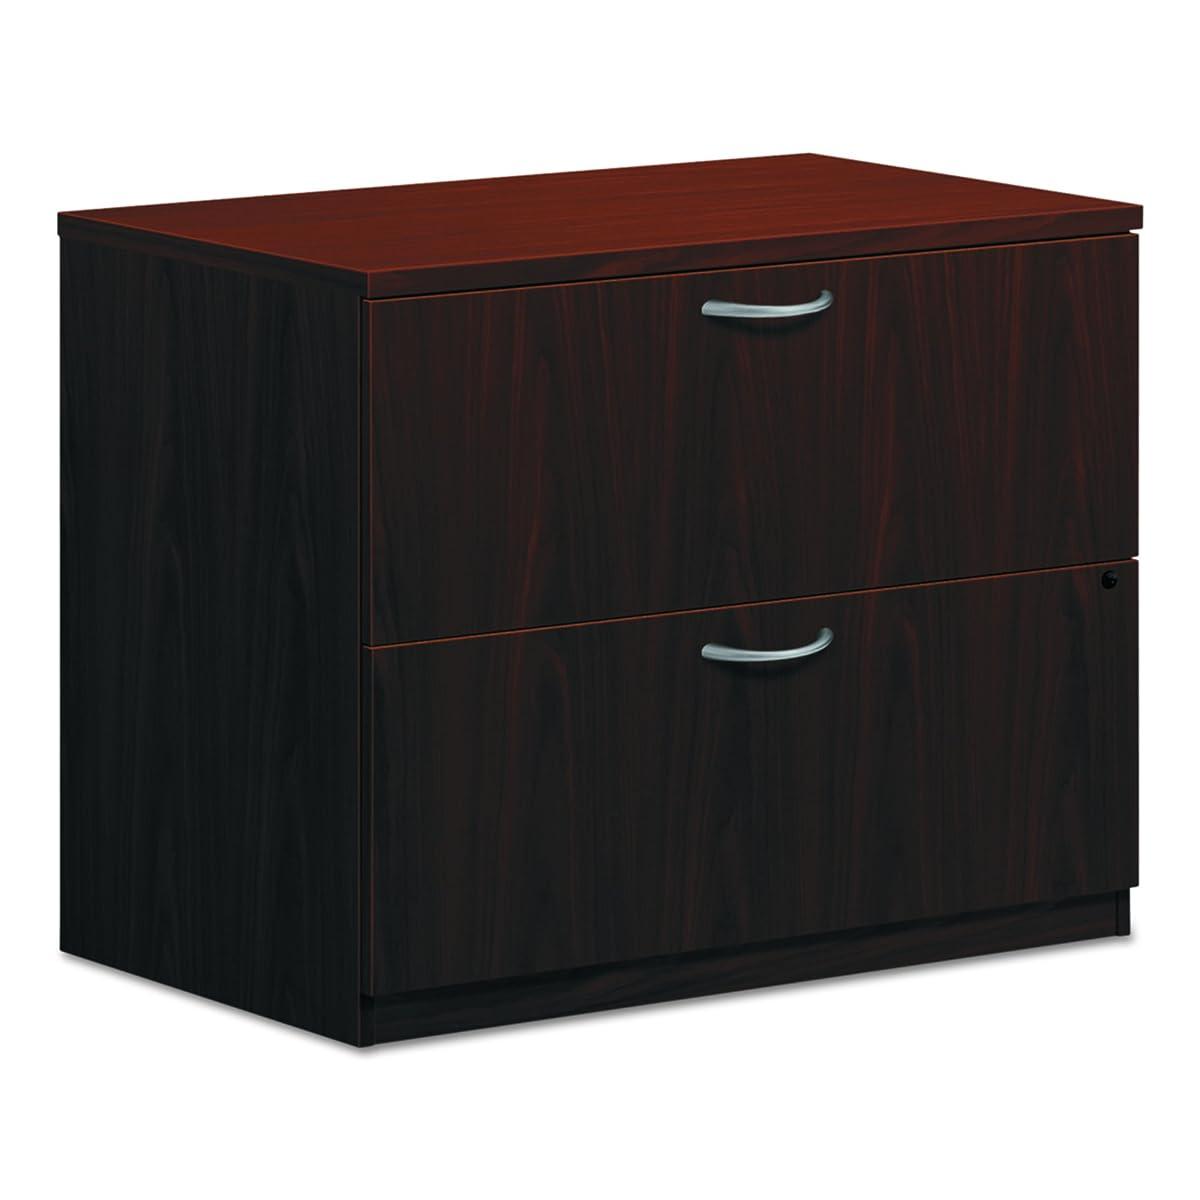 "HON 2-Drawer Office Filing Cabinet - BL Laminate Series Lateral File, 22"" D, Mahogany (HBL2171)"